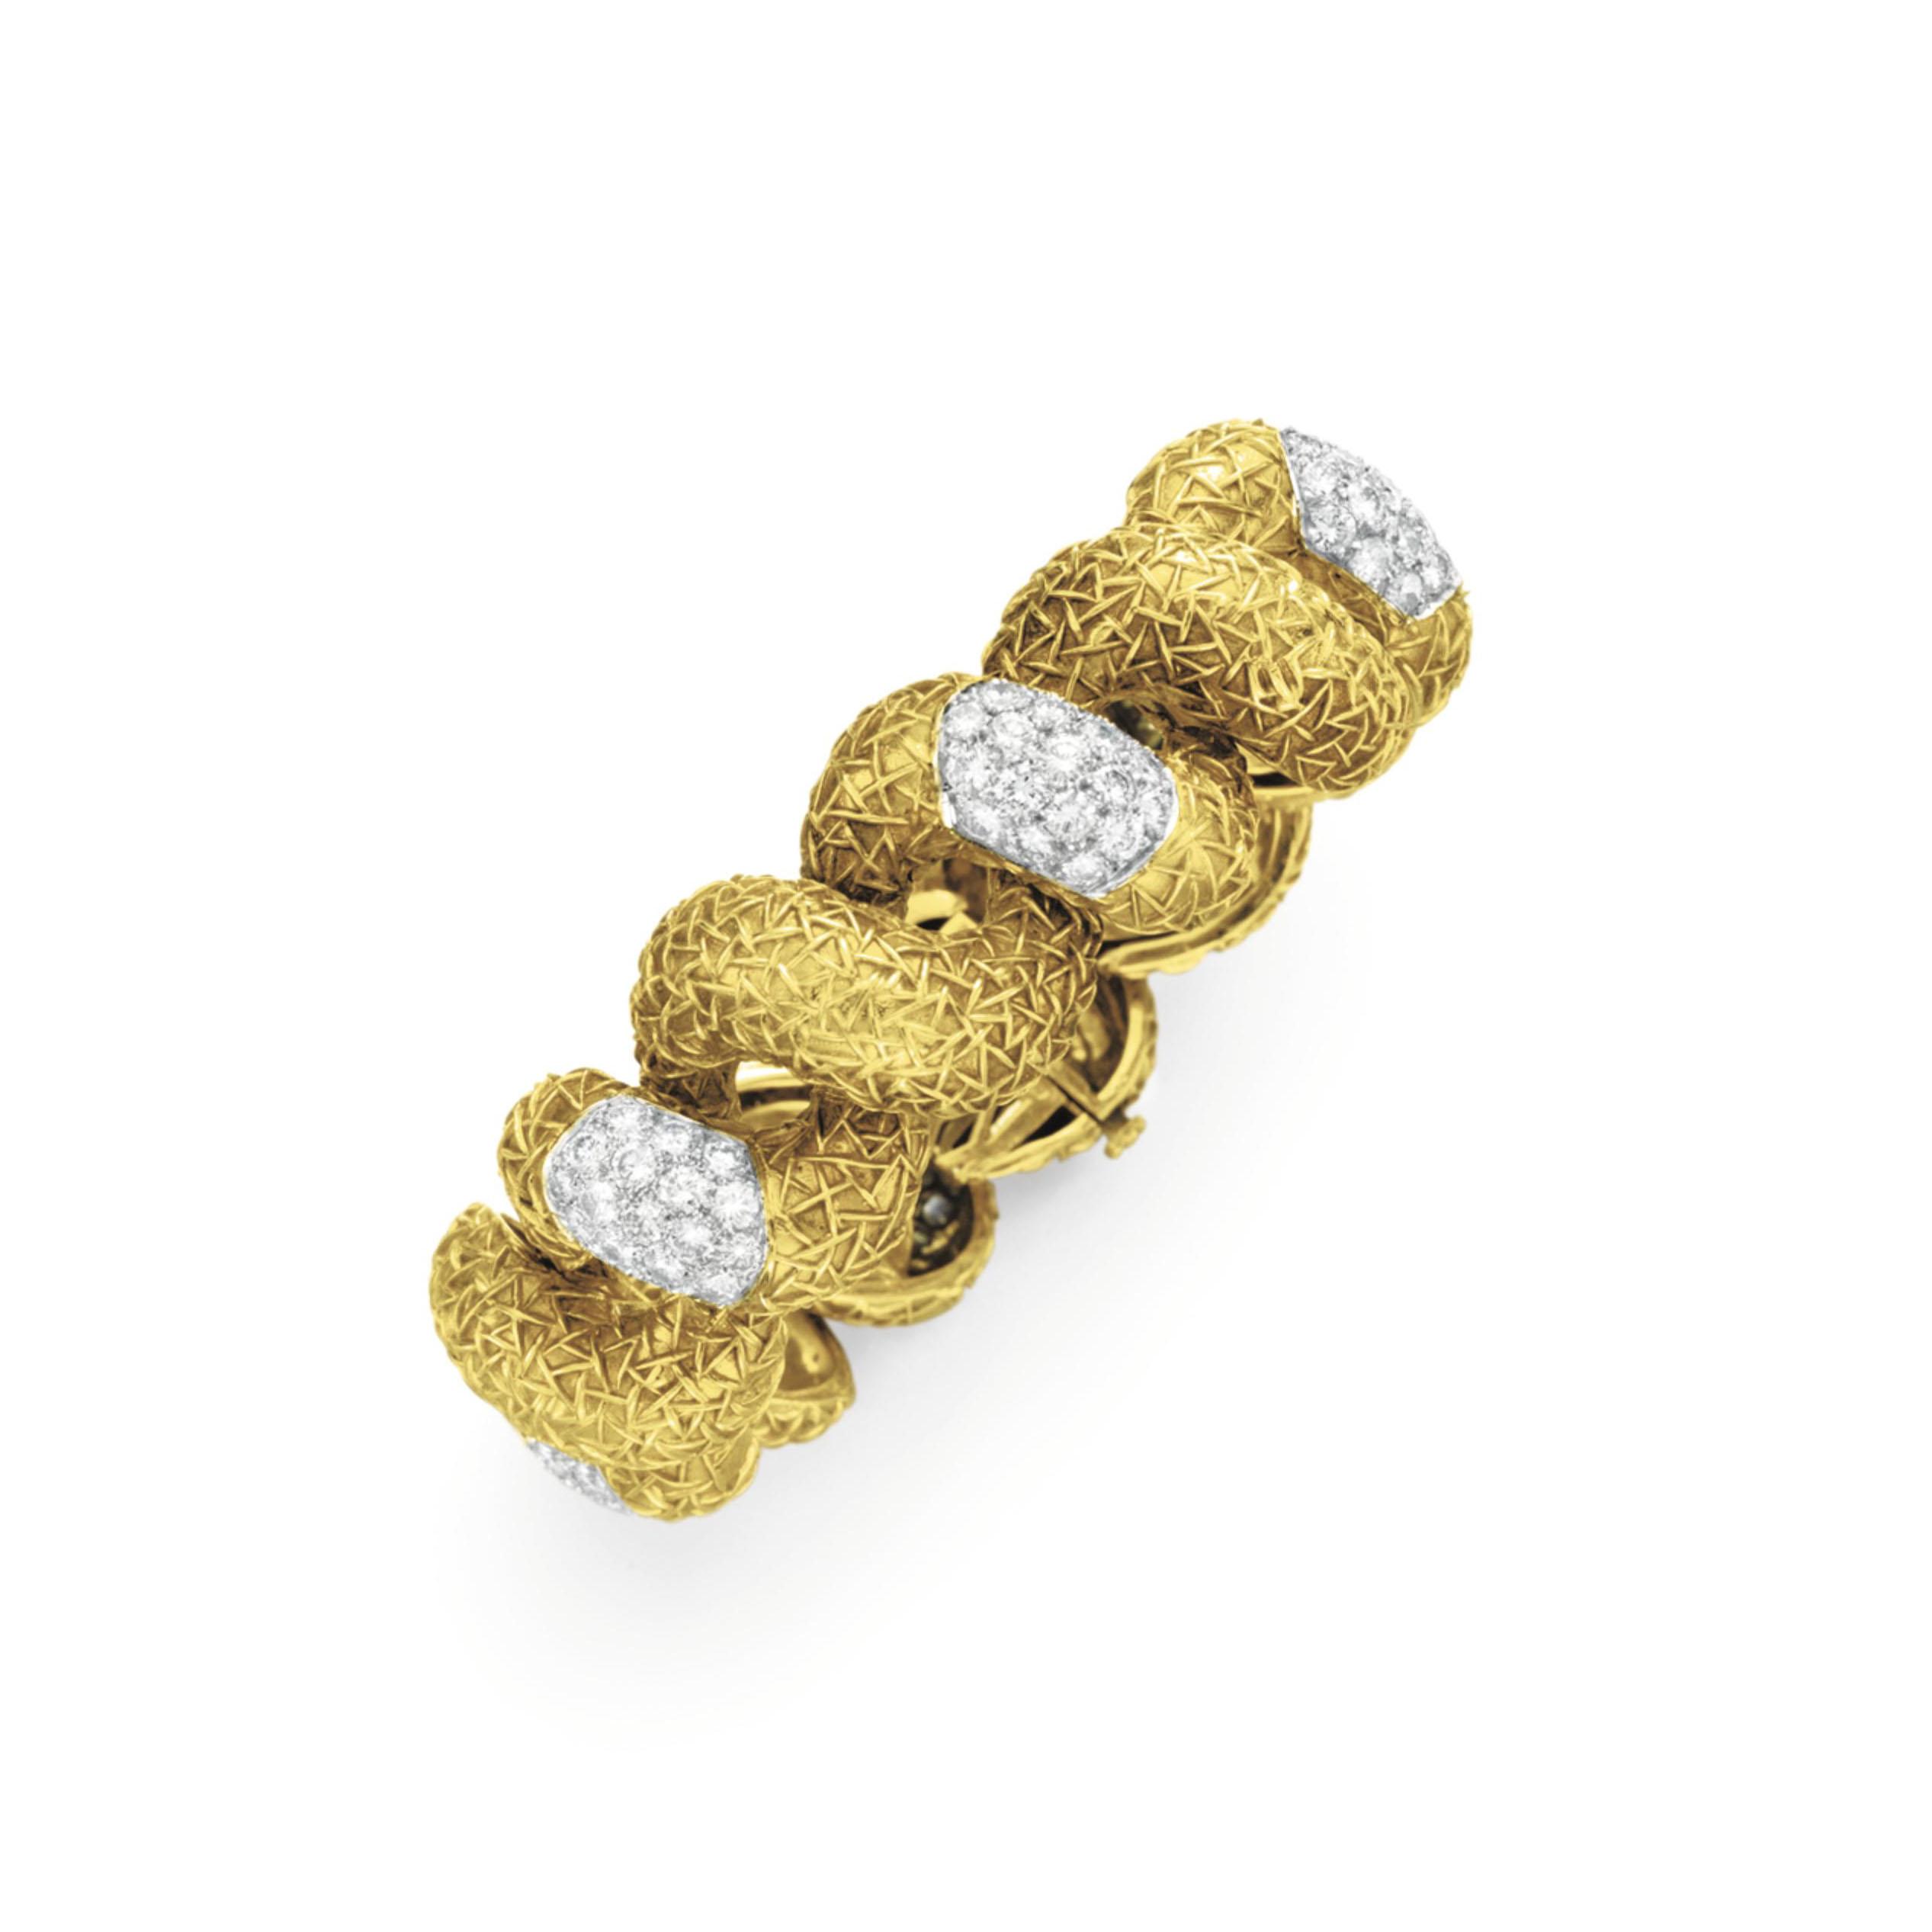 A DIAMOND AND GOLD BRACELET, BY WANDER